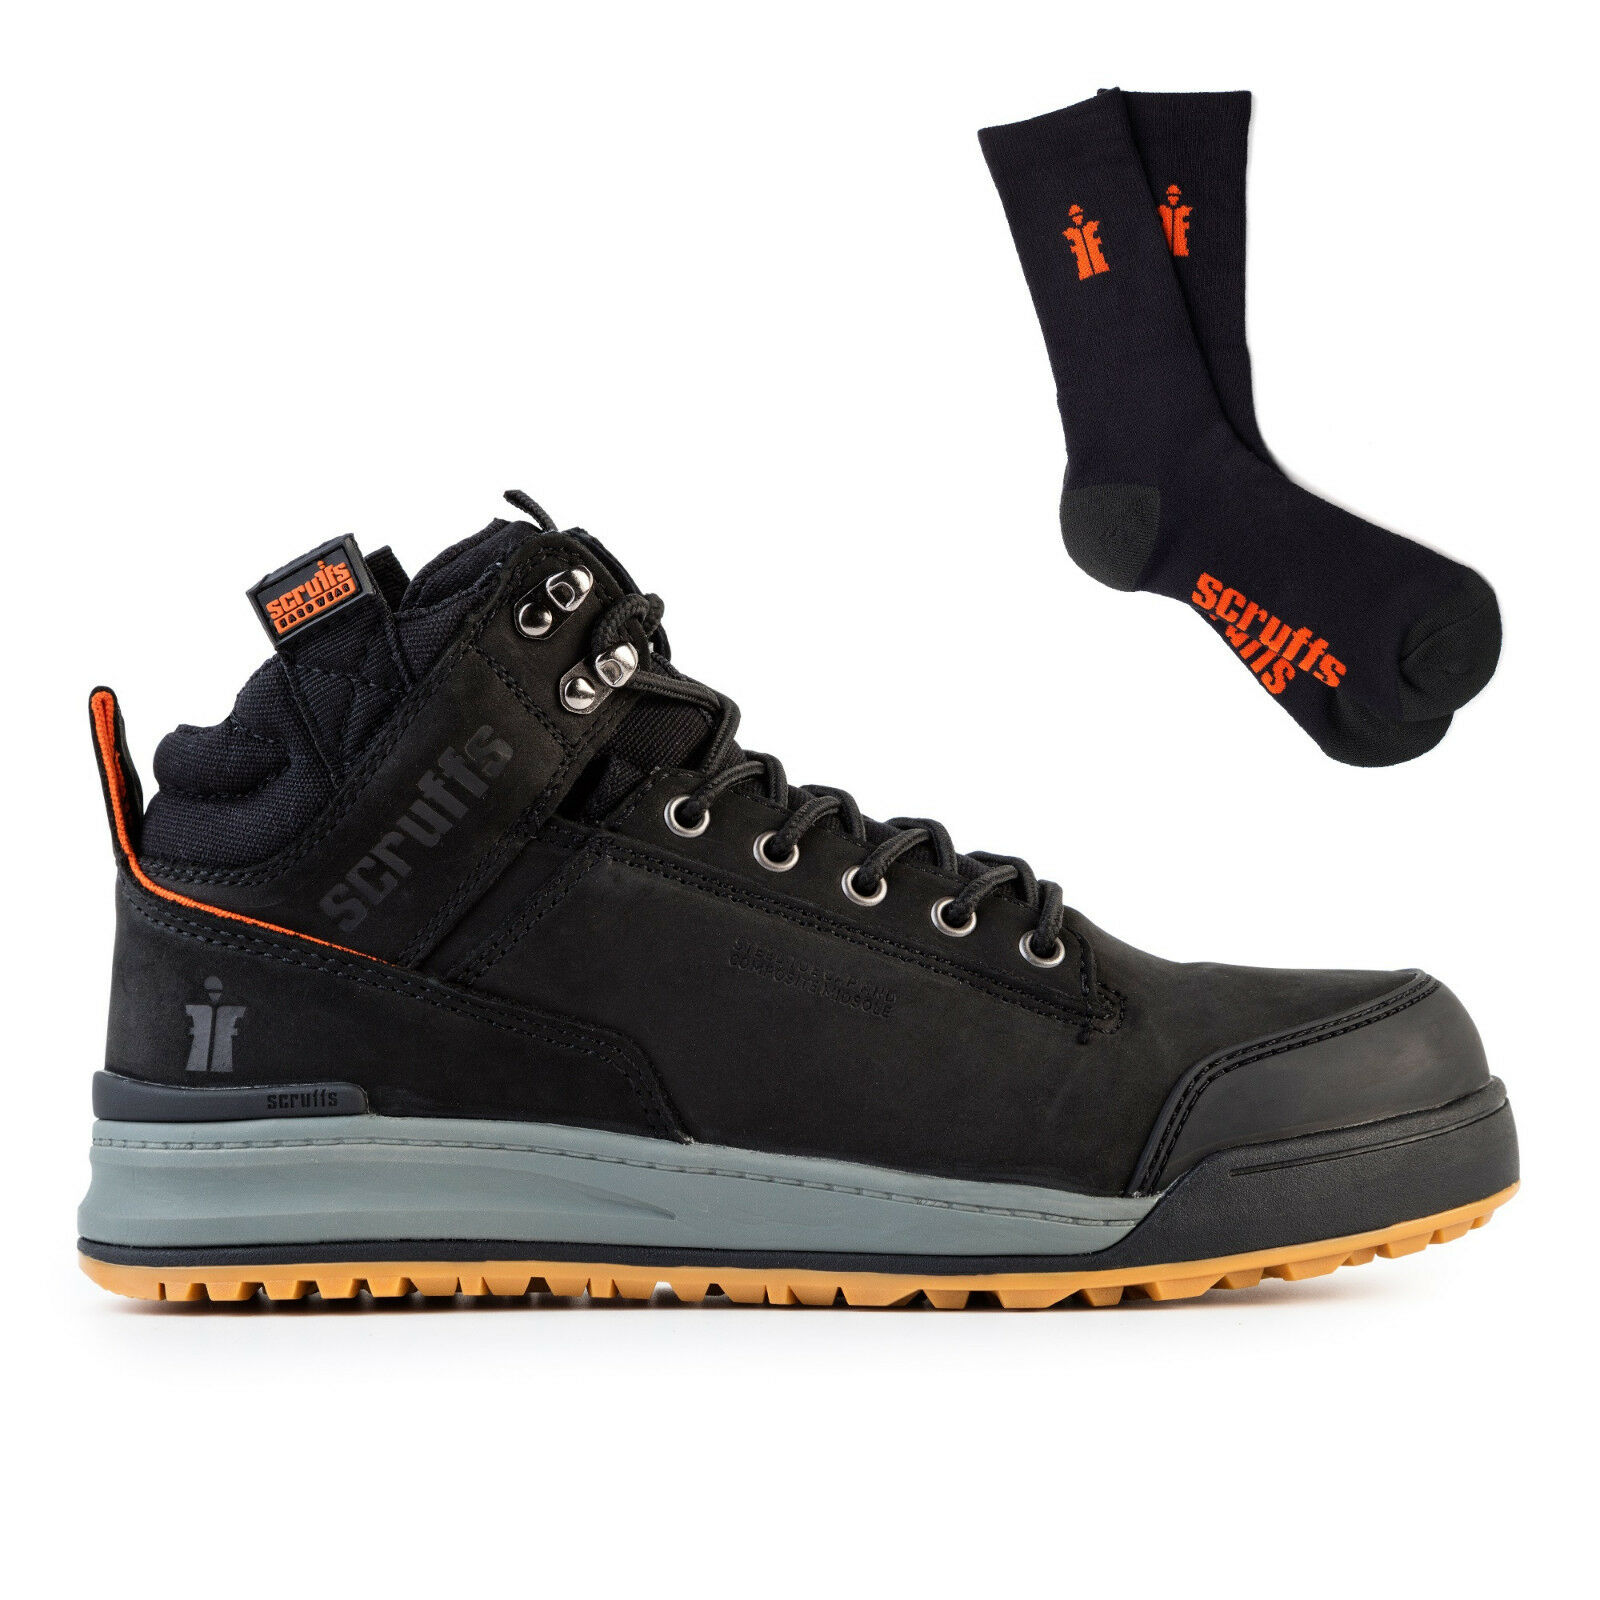 Scruffs Steel Switchback Safety Work Stiefel Steel Scruffs Toe BLACK with 3 Pack Worker Socks f6221c